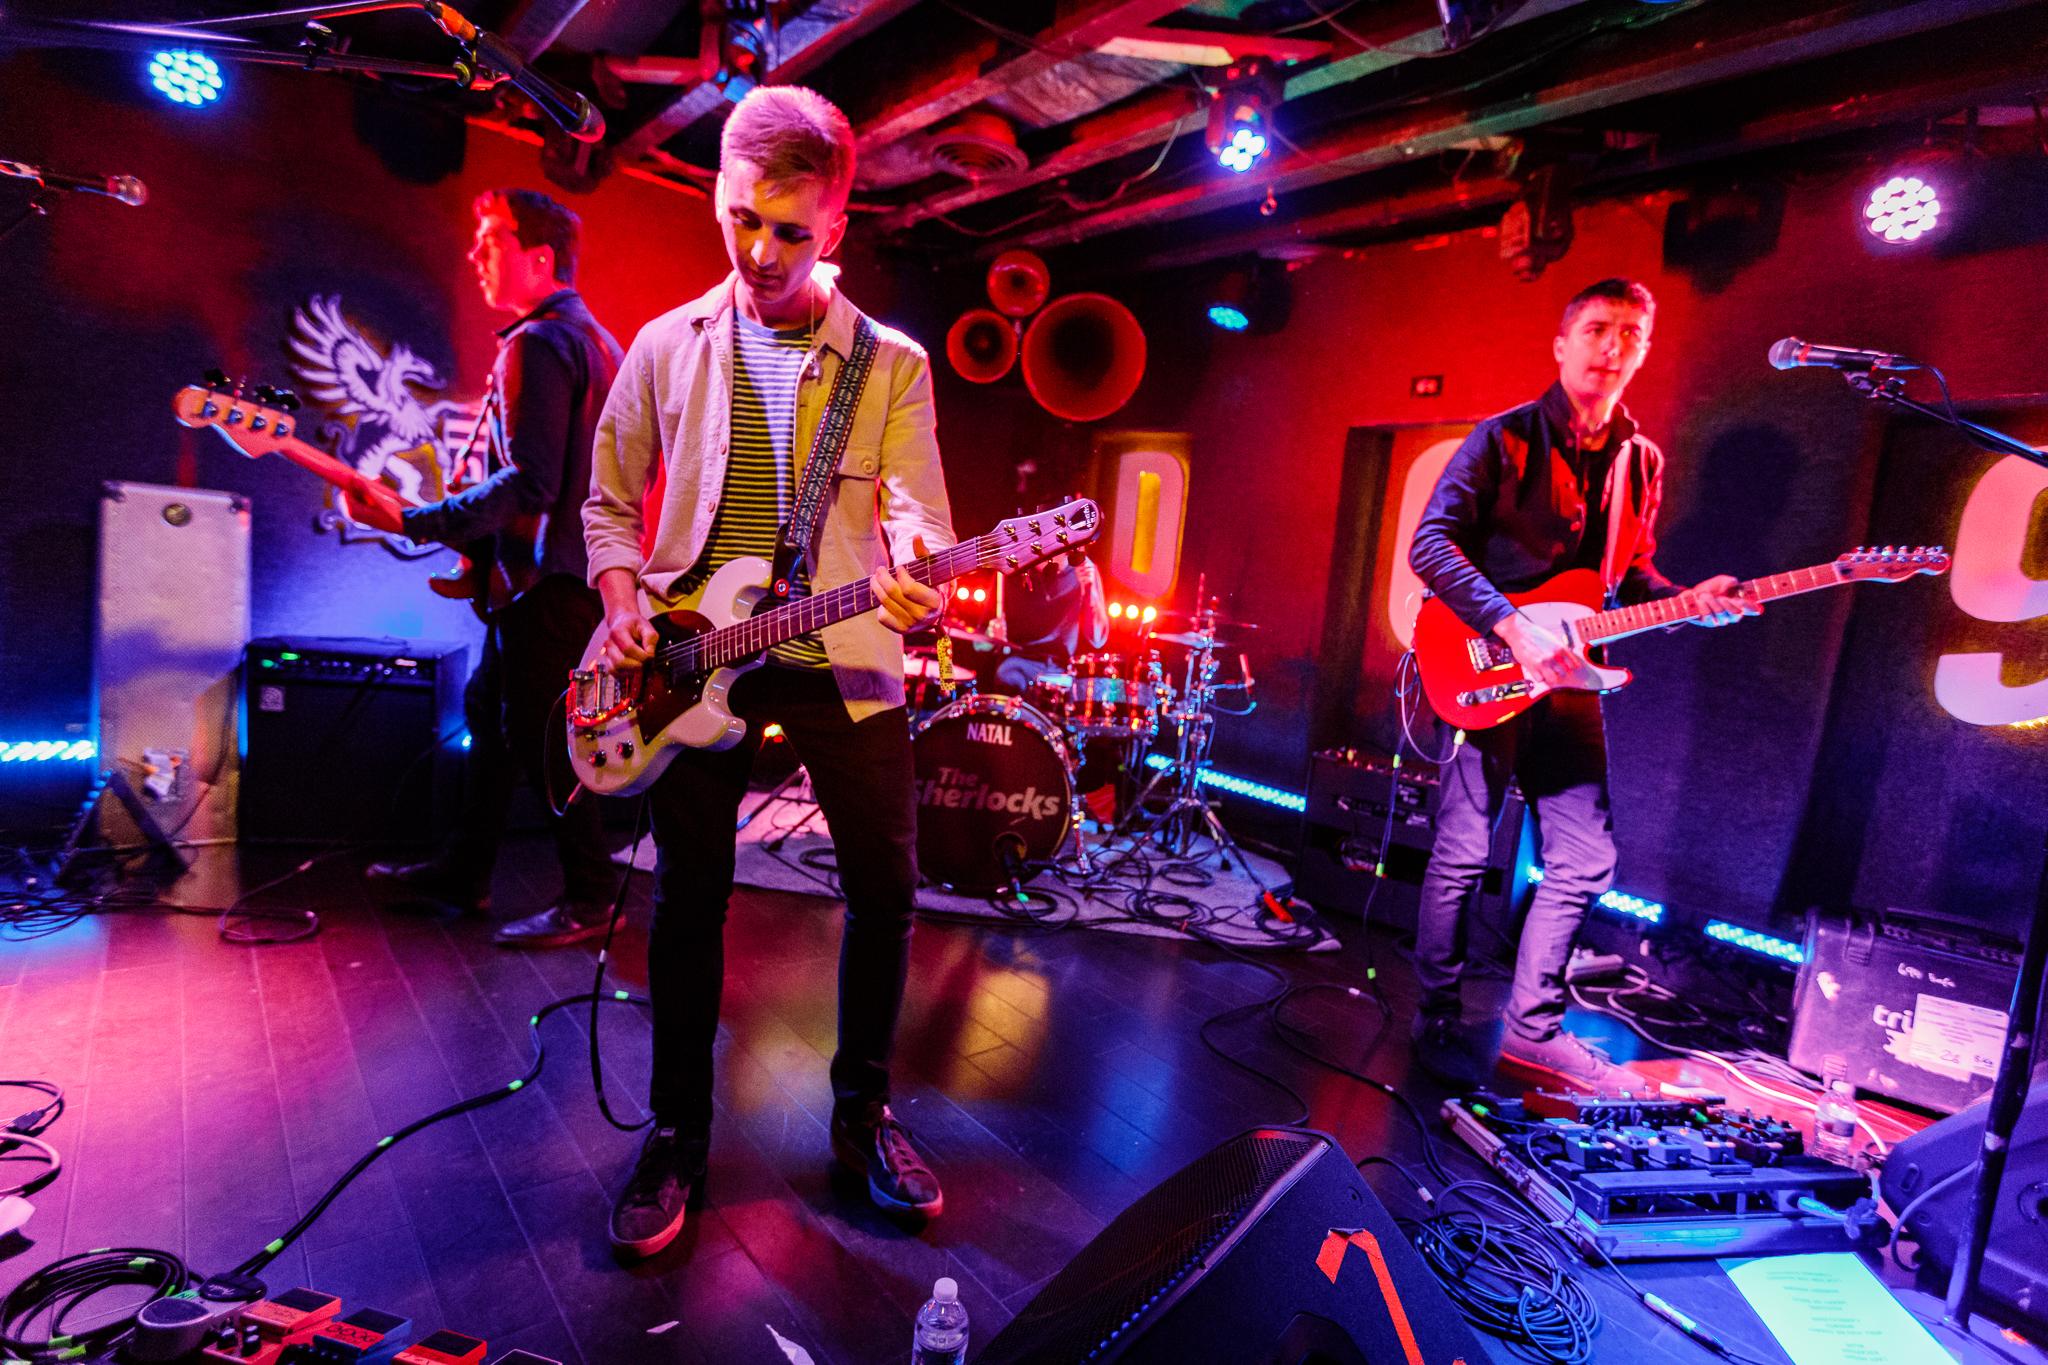 The Sherlocks performing at DC9 in Washington, DC - 5/7/2018 (photo by Matt Condon / @arcane93)